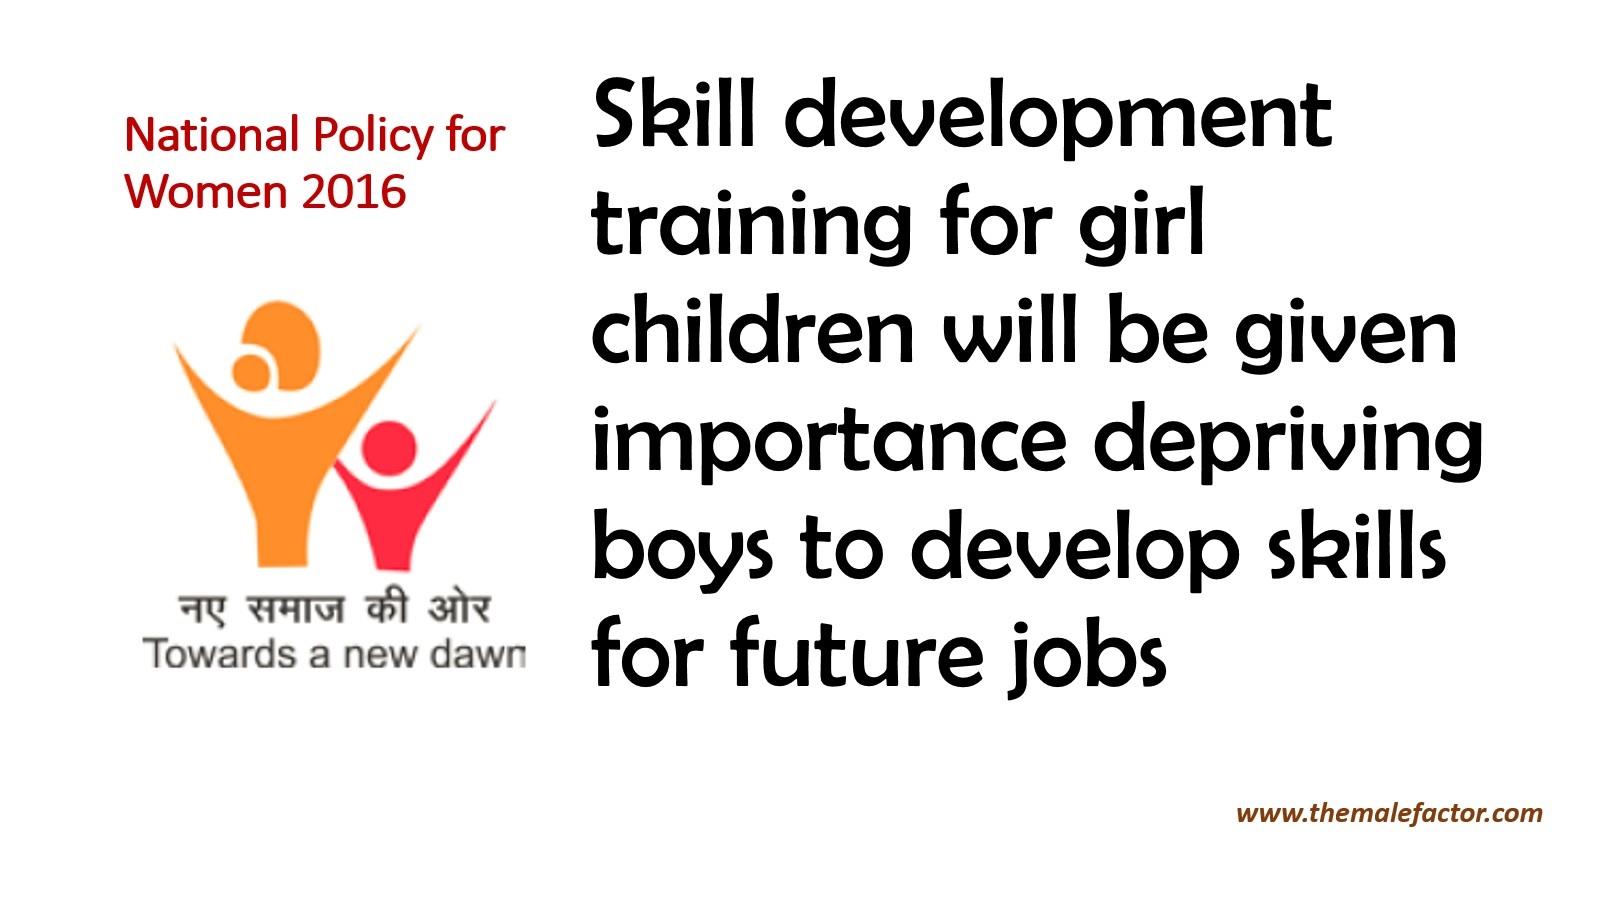 National policy on women_Skill Development